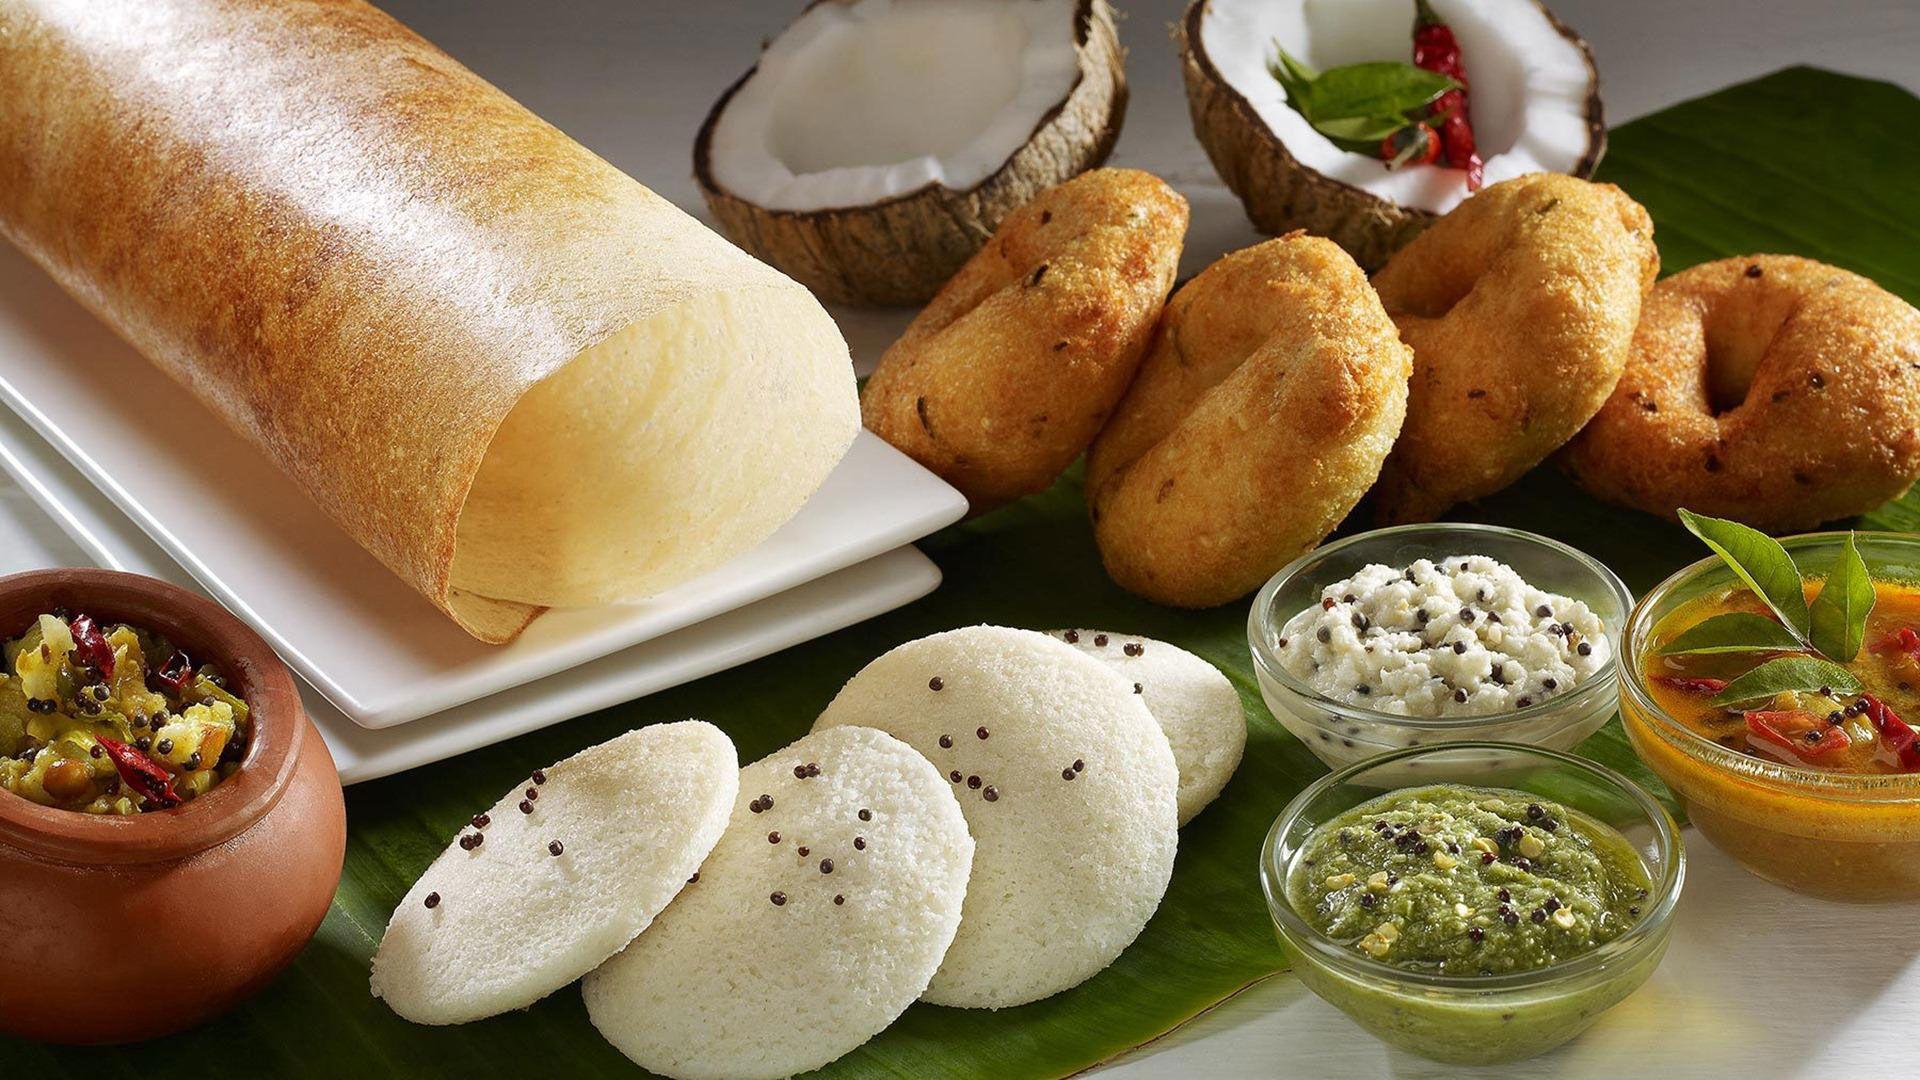 hd pics photos food kerala traditional desktop background